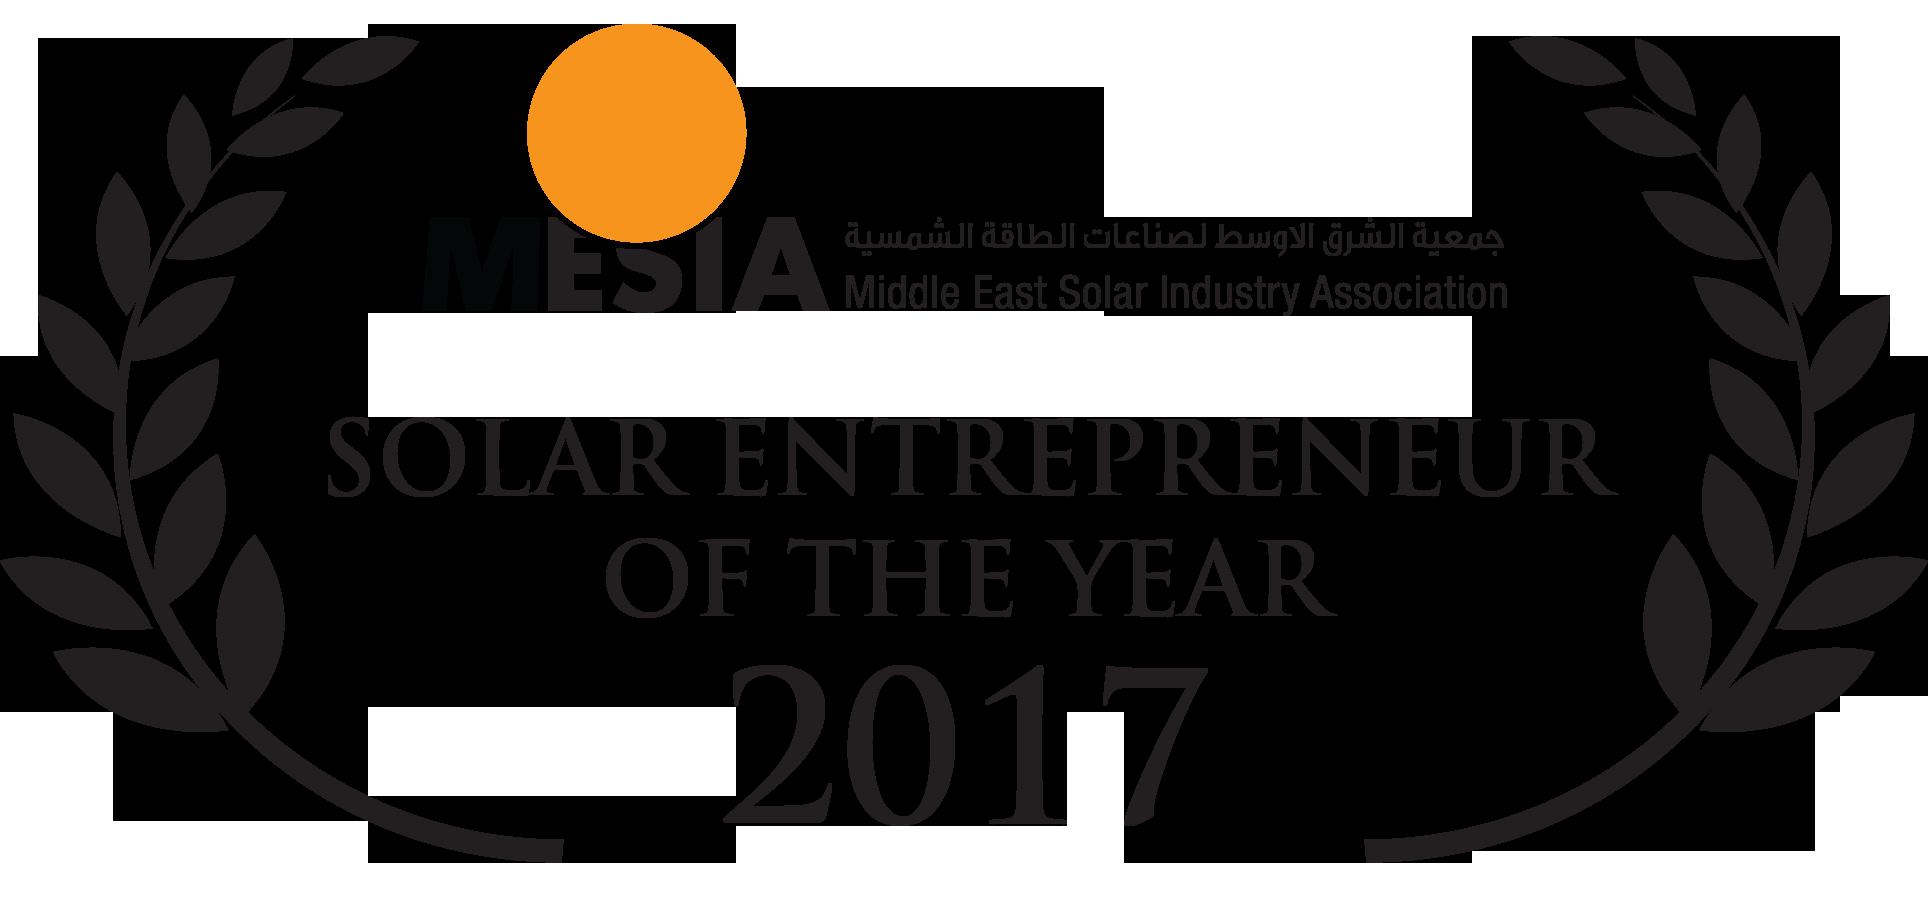 2017 Solar Entrepreneur of the Year Enerwhere Daniel Zywietz